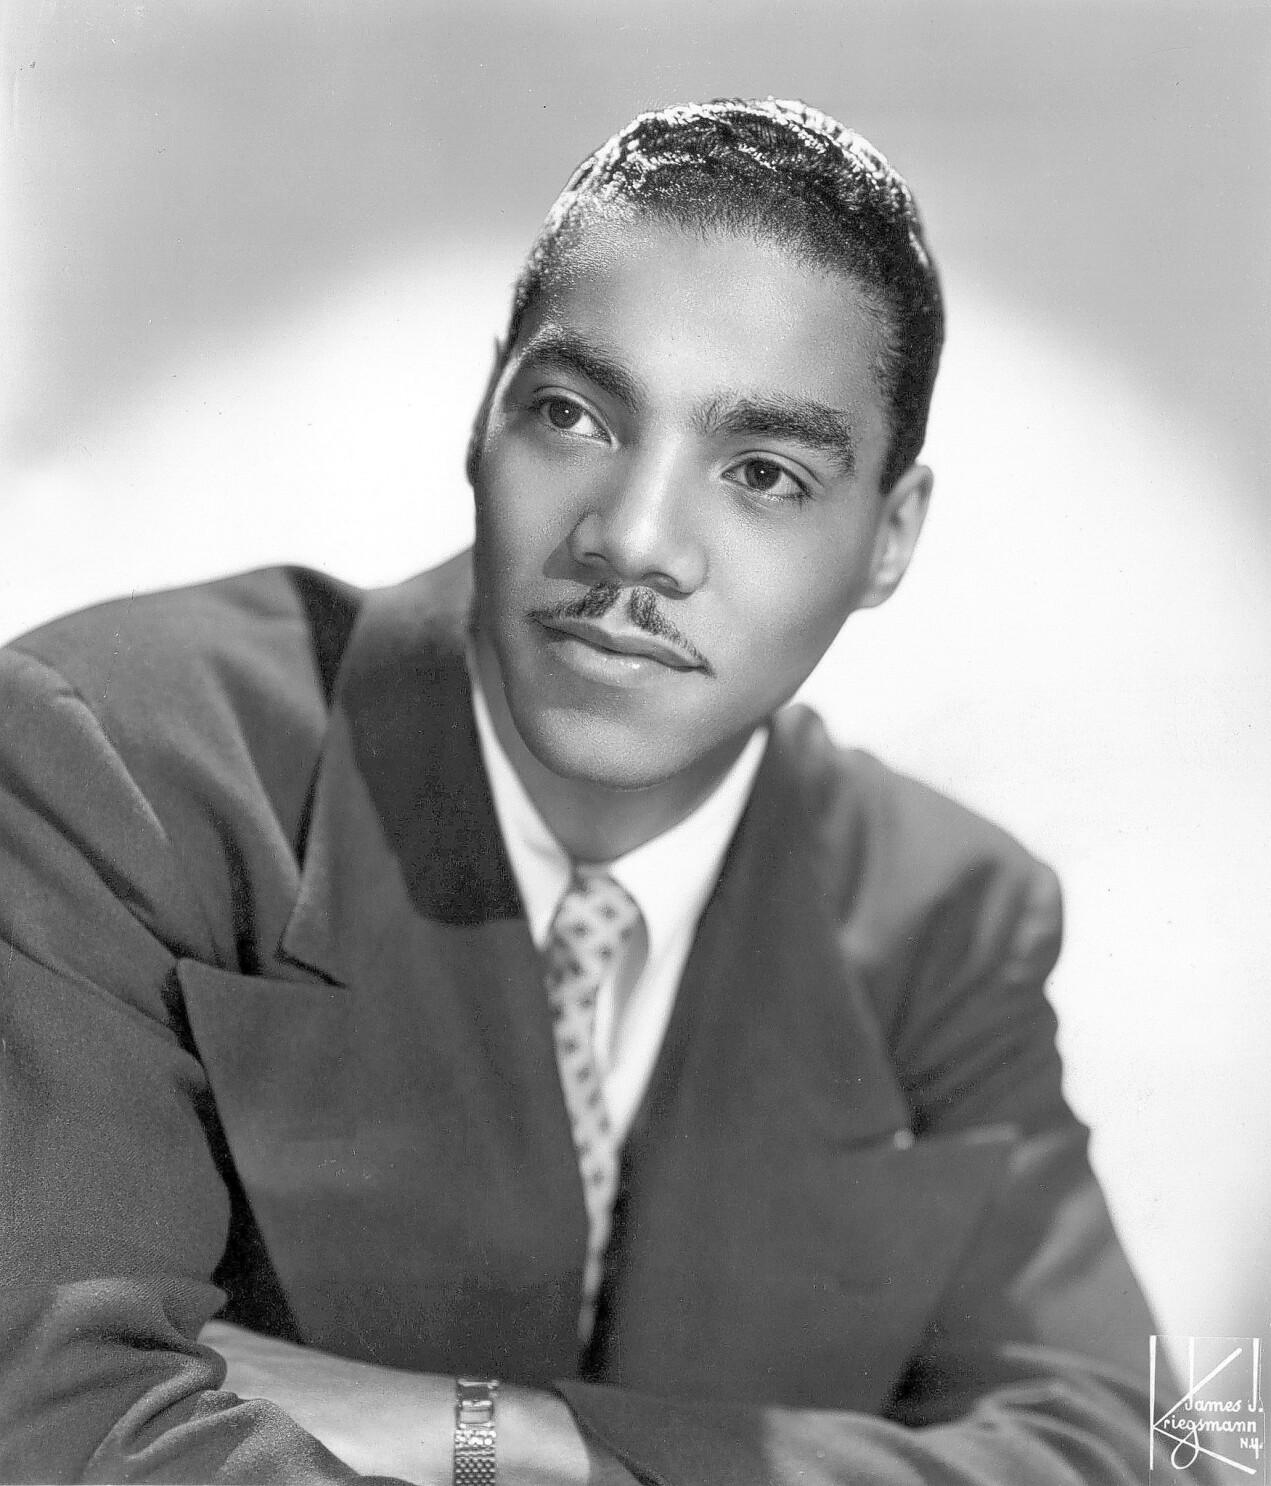 Bob Bailey Singer And Las Vegas Civil Rights Pioneer Dies At 87 Los Angeles Times